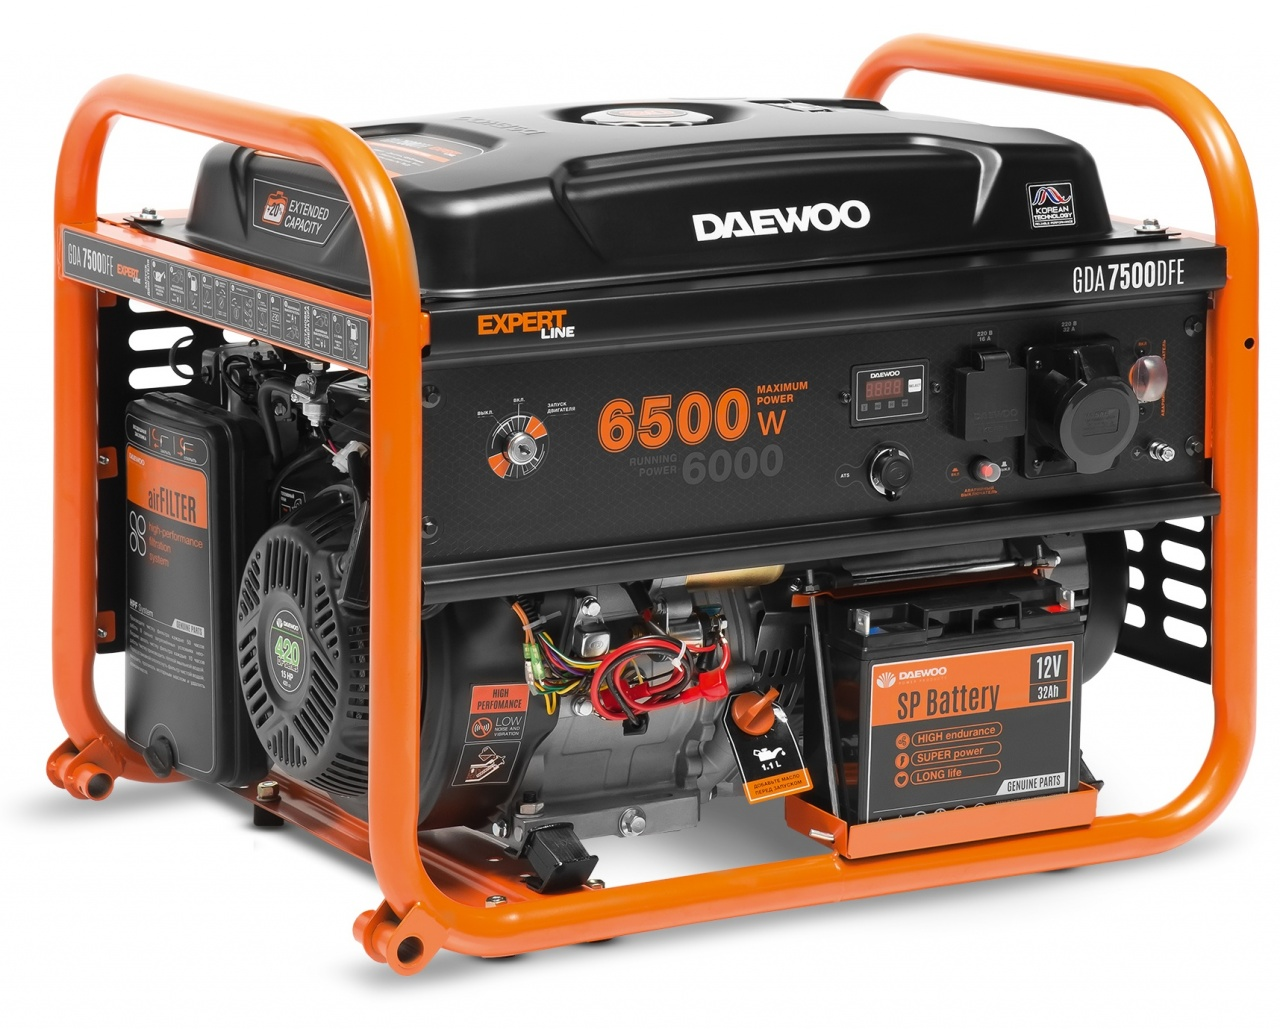 газовая электростанция daewoo gda 7500 dfe